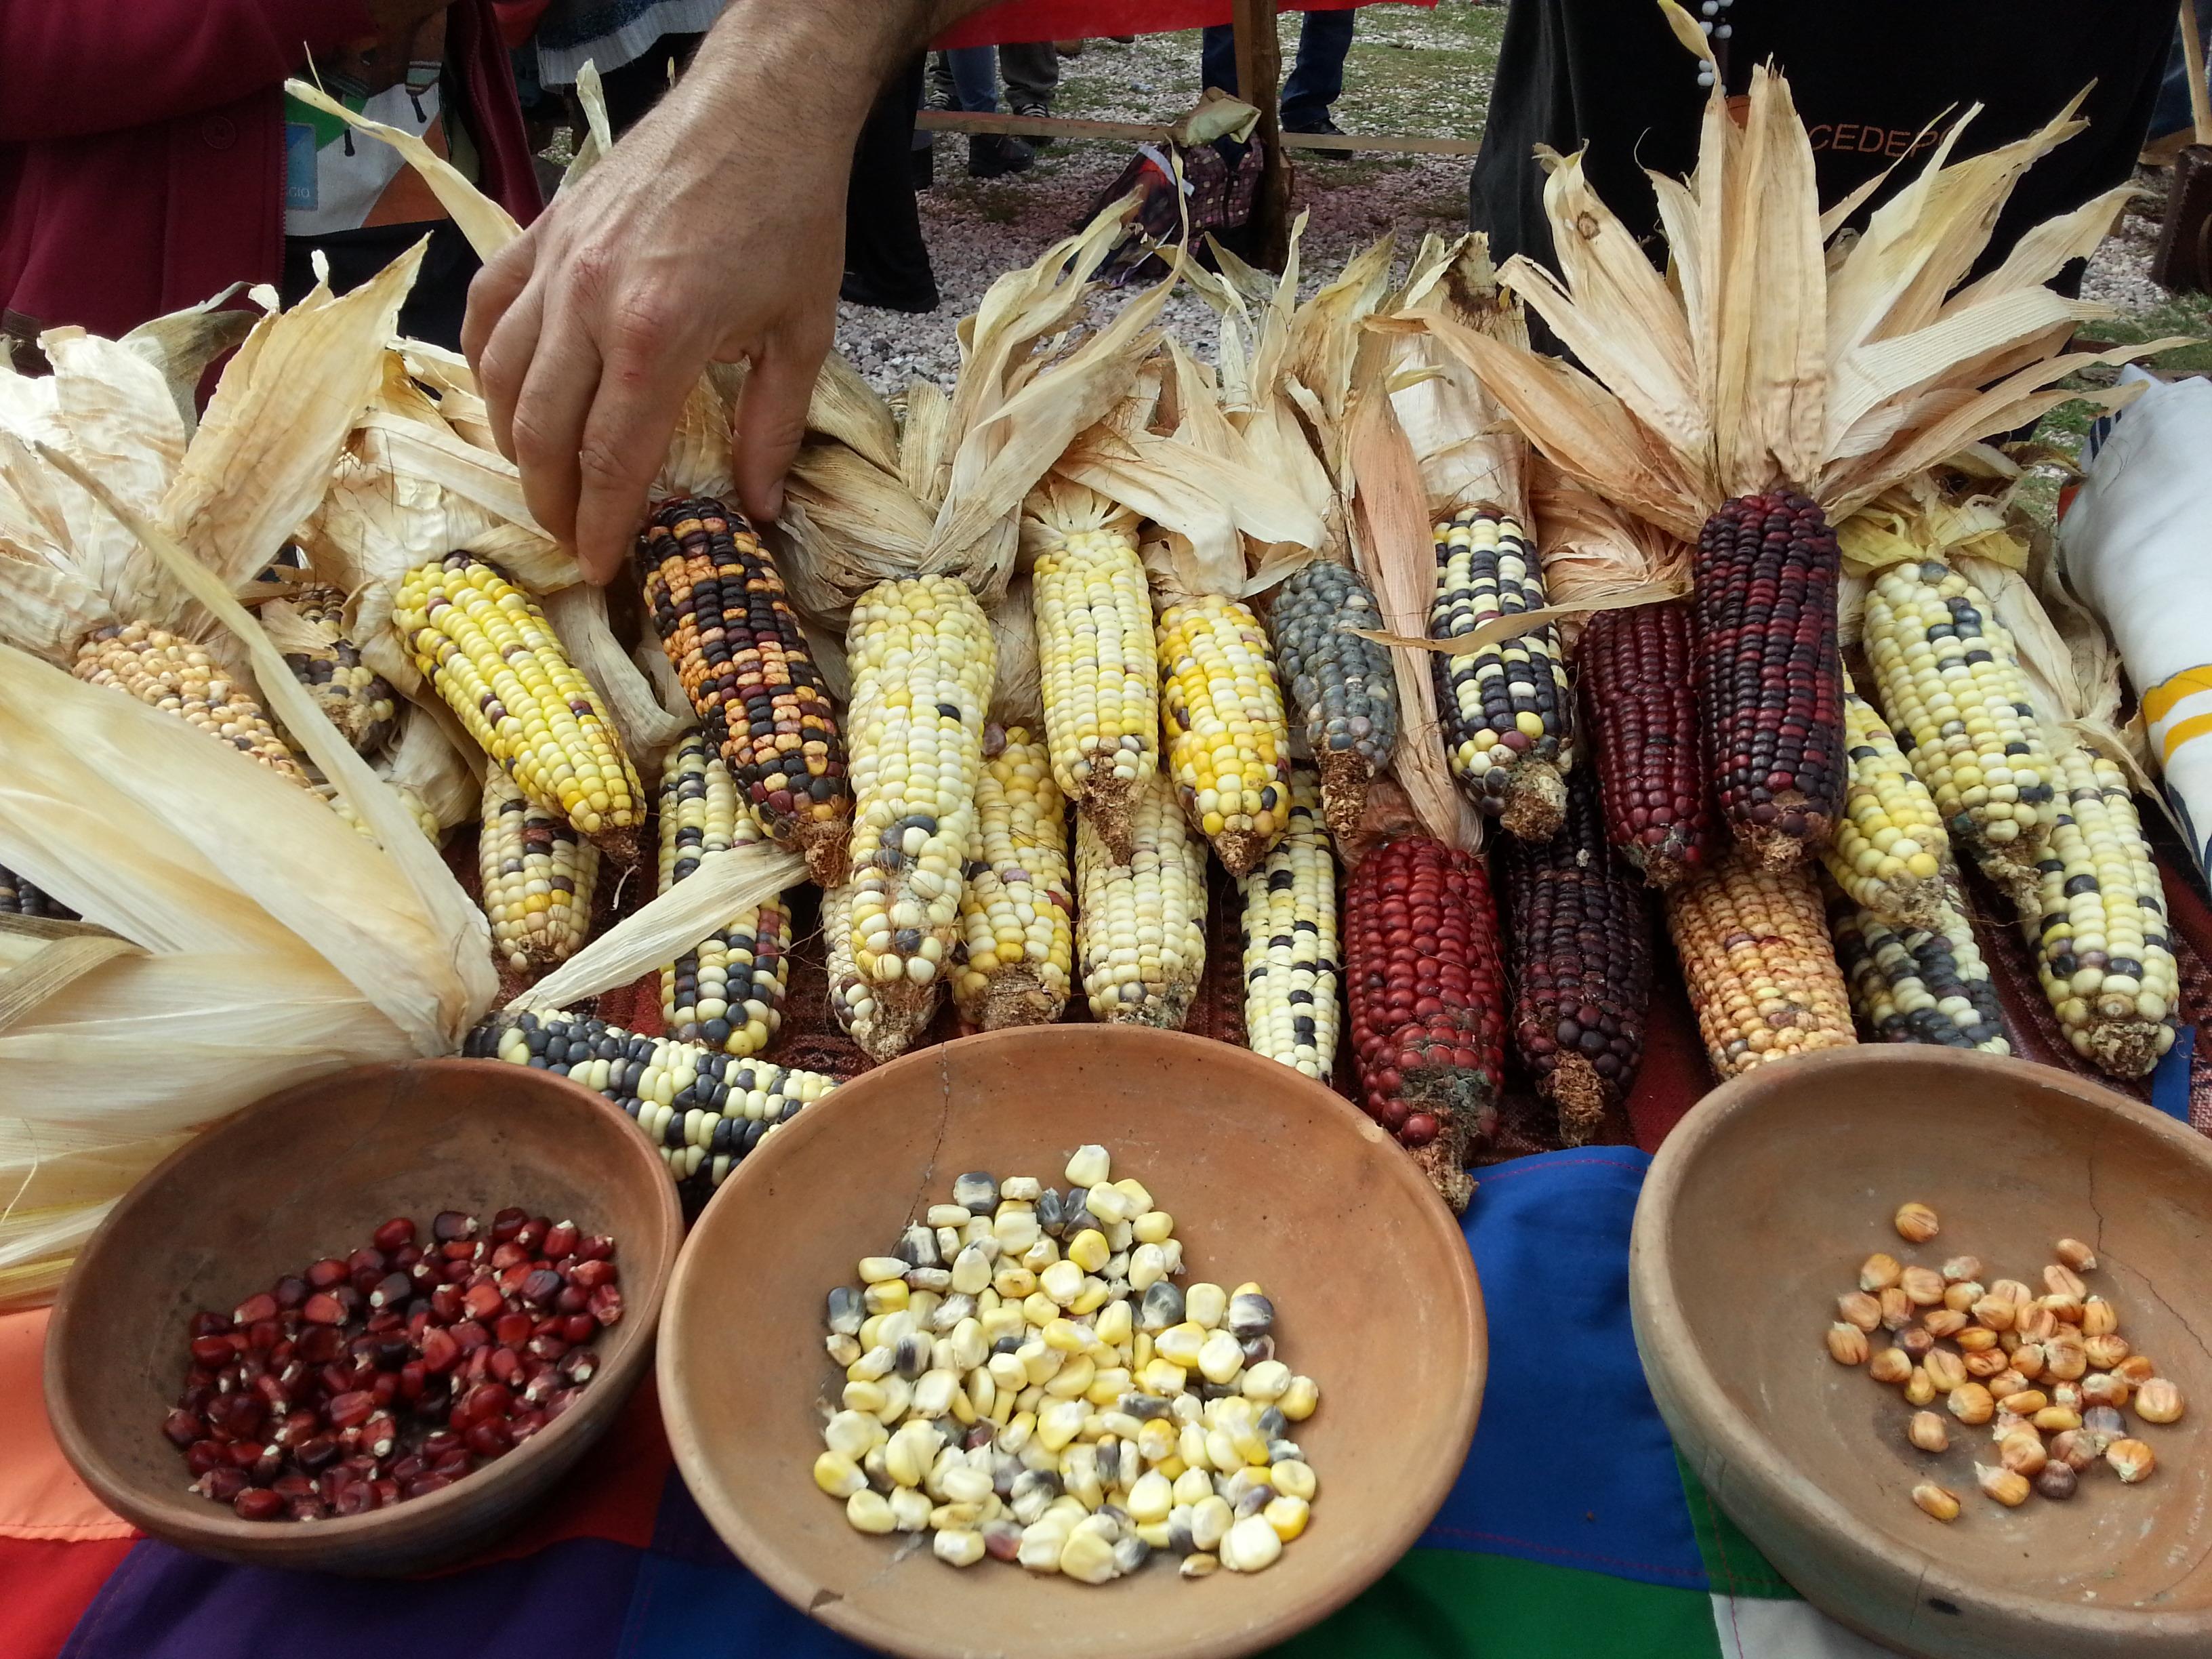 Corn on table